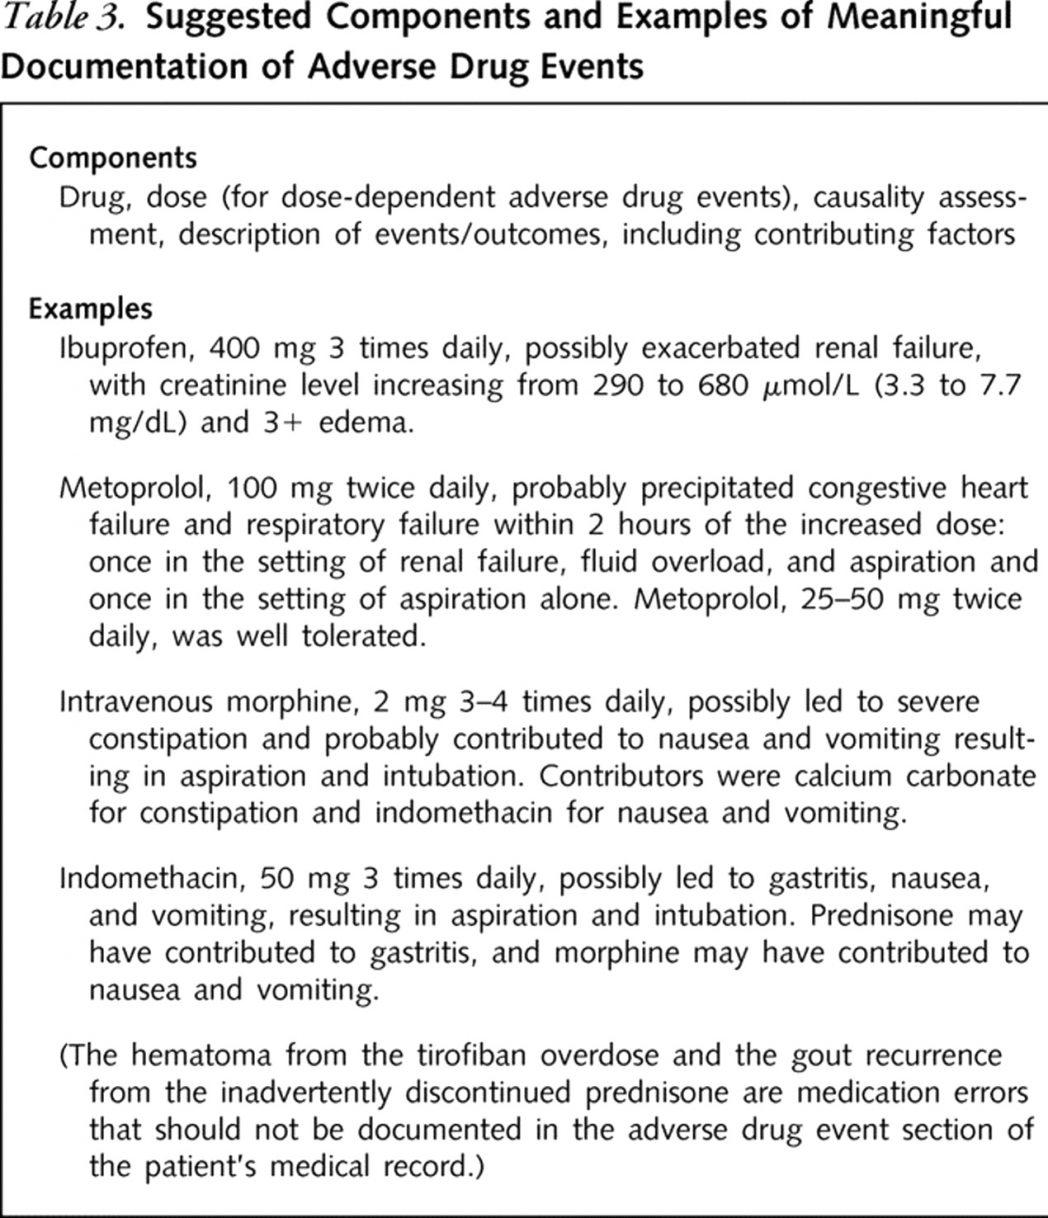 003 Nurse Essays Essay Mentorship The Aim Of This Nursing Paper Writing Help Services 1048x1218 Shocking Mentoring Example Contoh Full